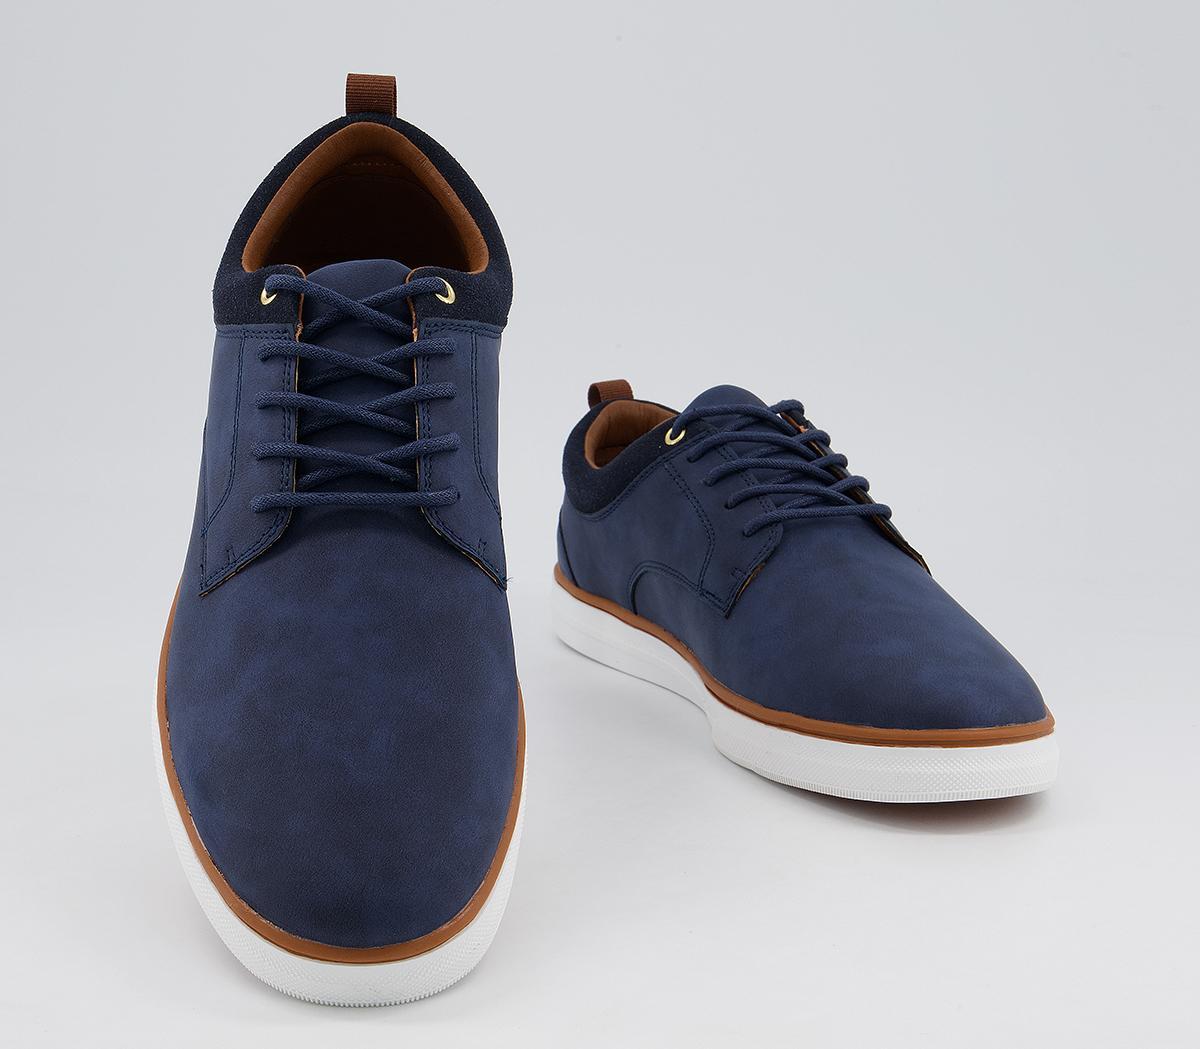 Camacho Low Sneakers